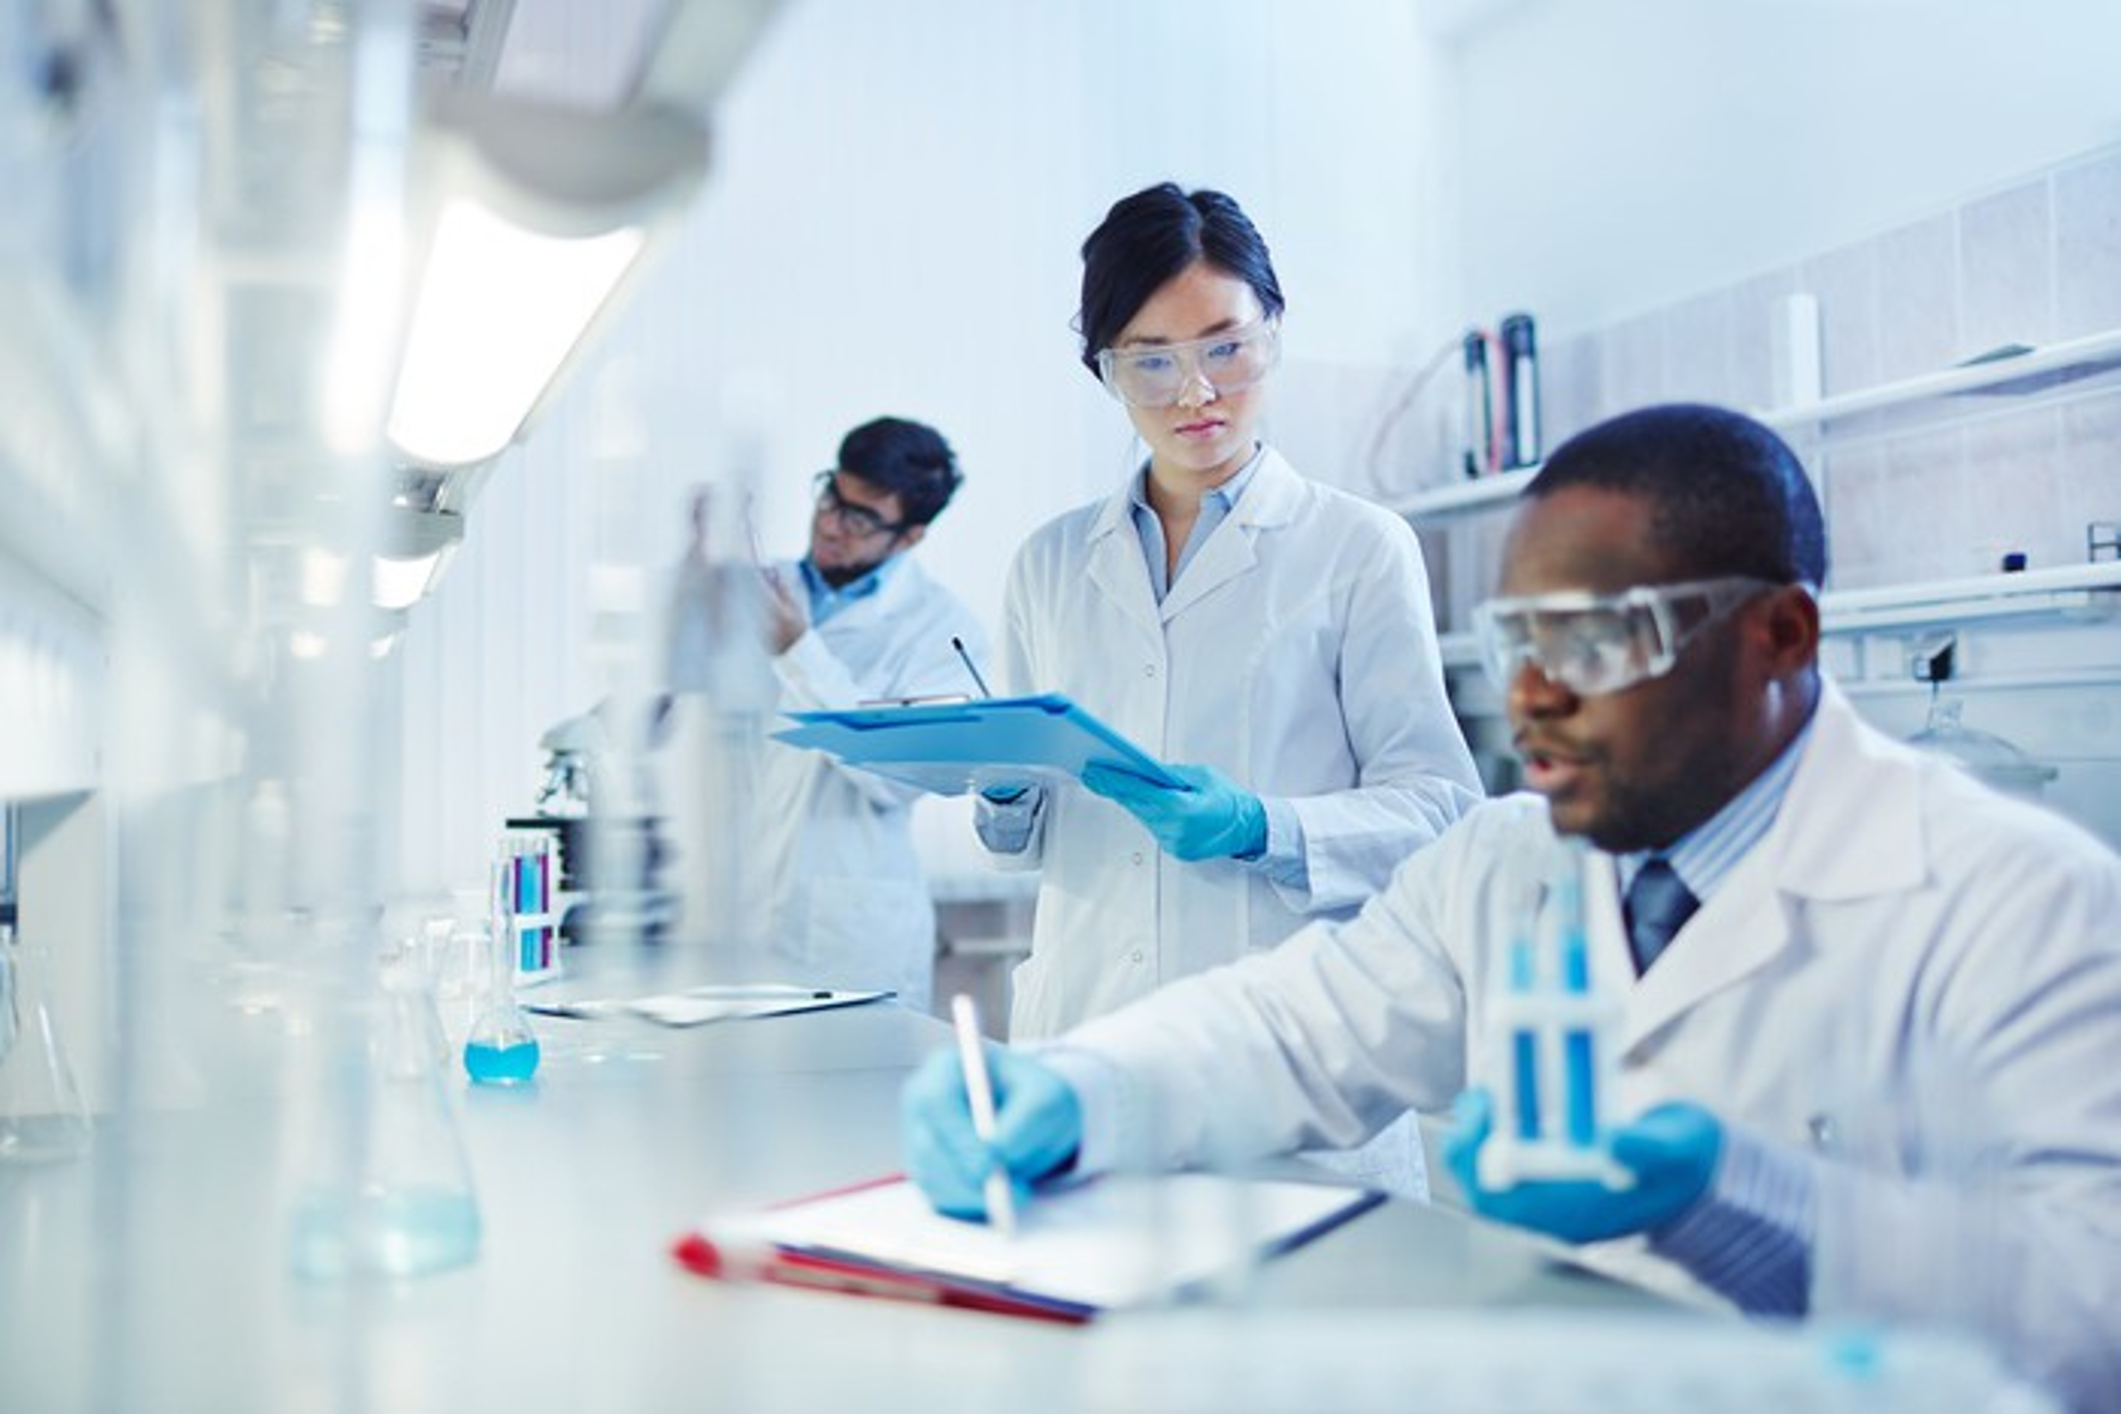 Scientists work together to develop new medicine.